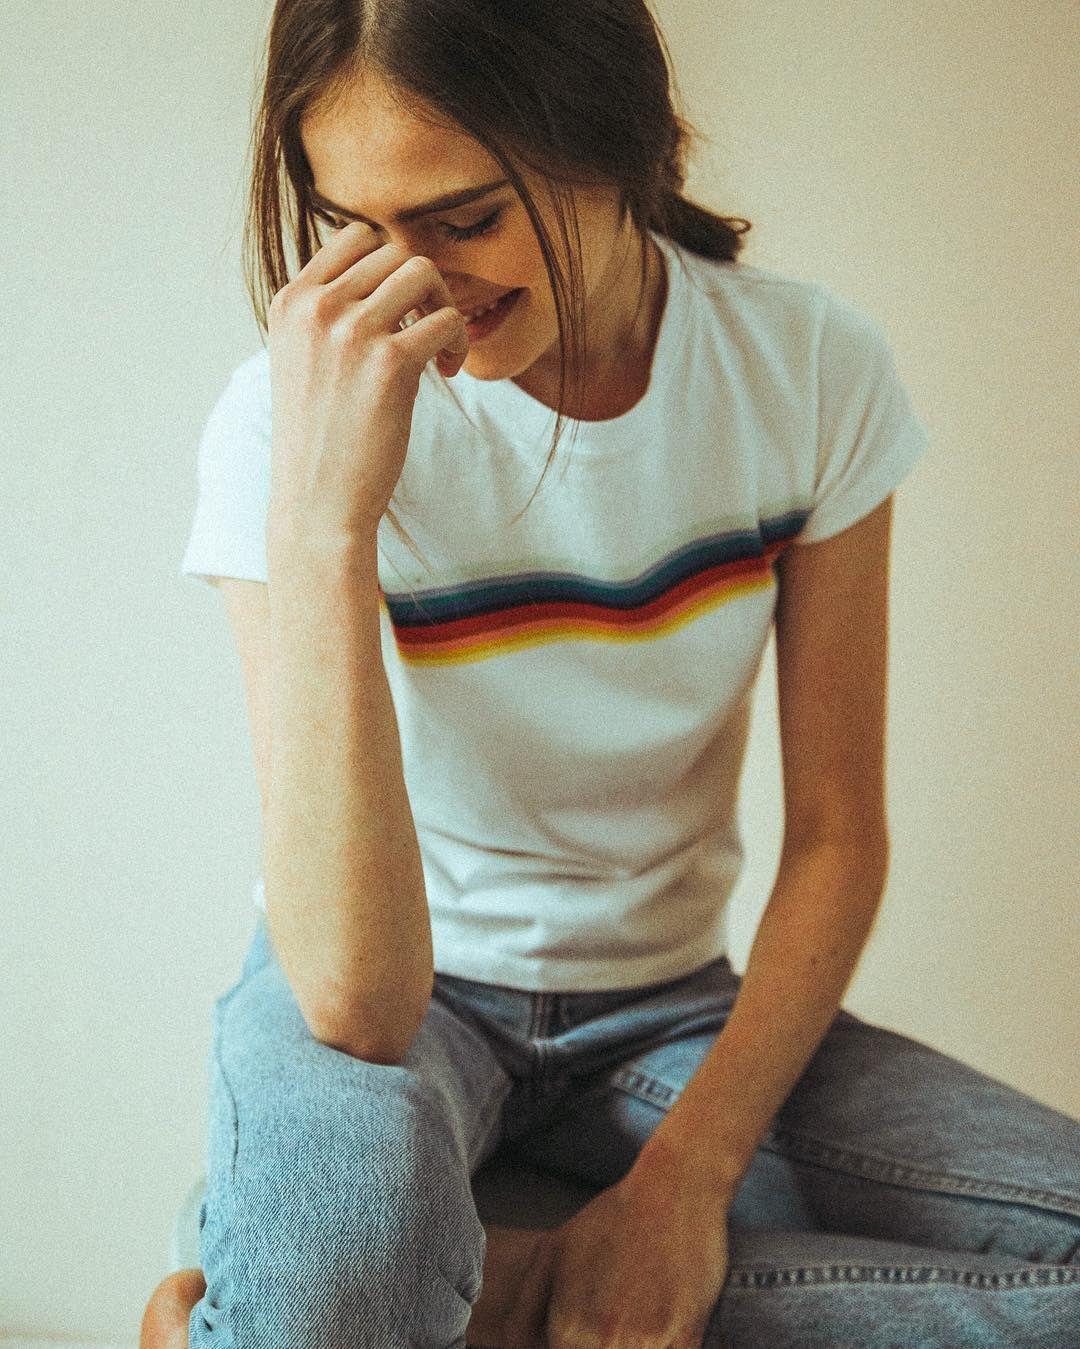 Brandy Melville Brandymelvilleusa Instagram Photos And Videos Brandy Melville Outfits Summer Rainbow Shirt Brandy Melville Outfits